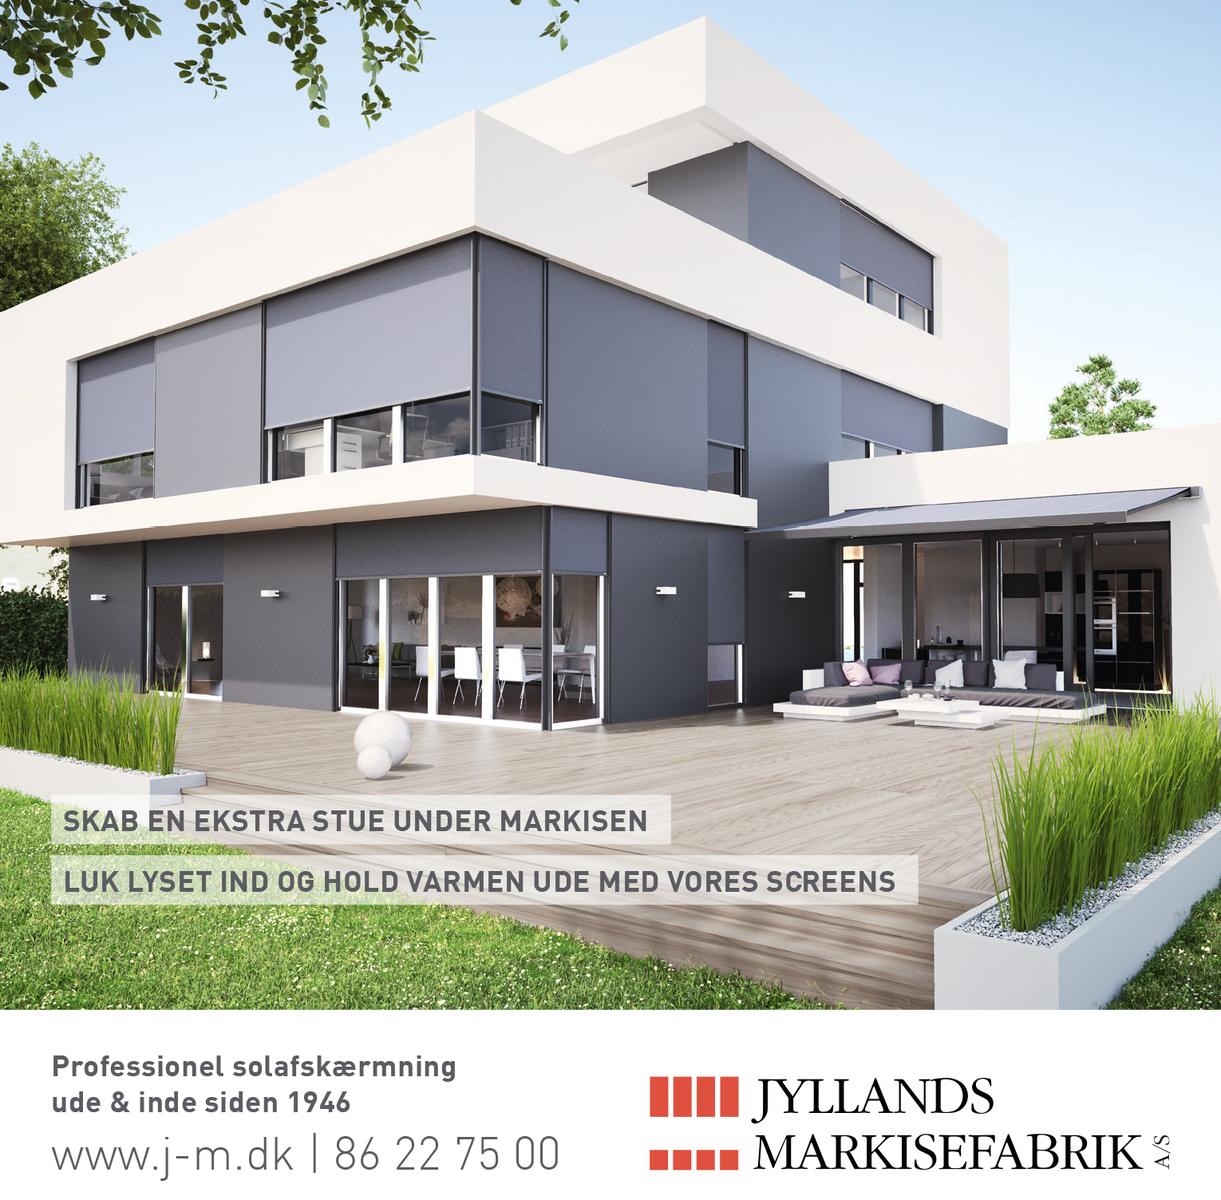 jyllandsmarkisefabrik.jpg